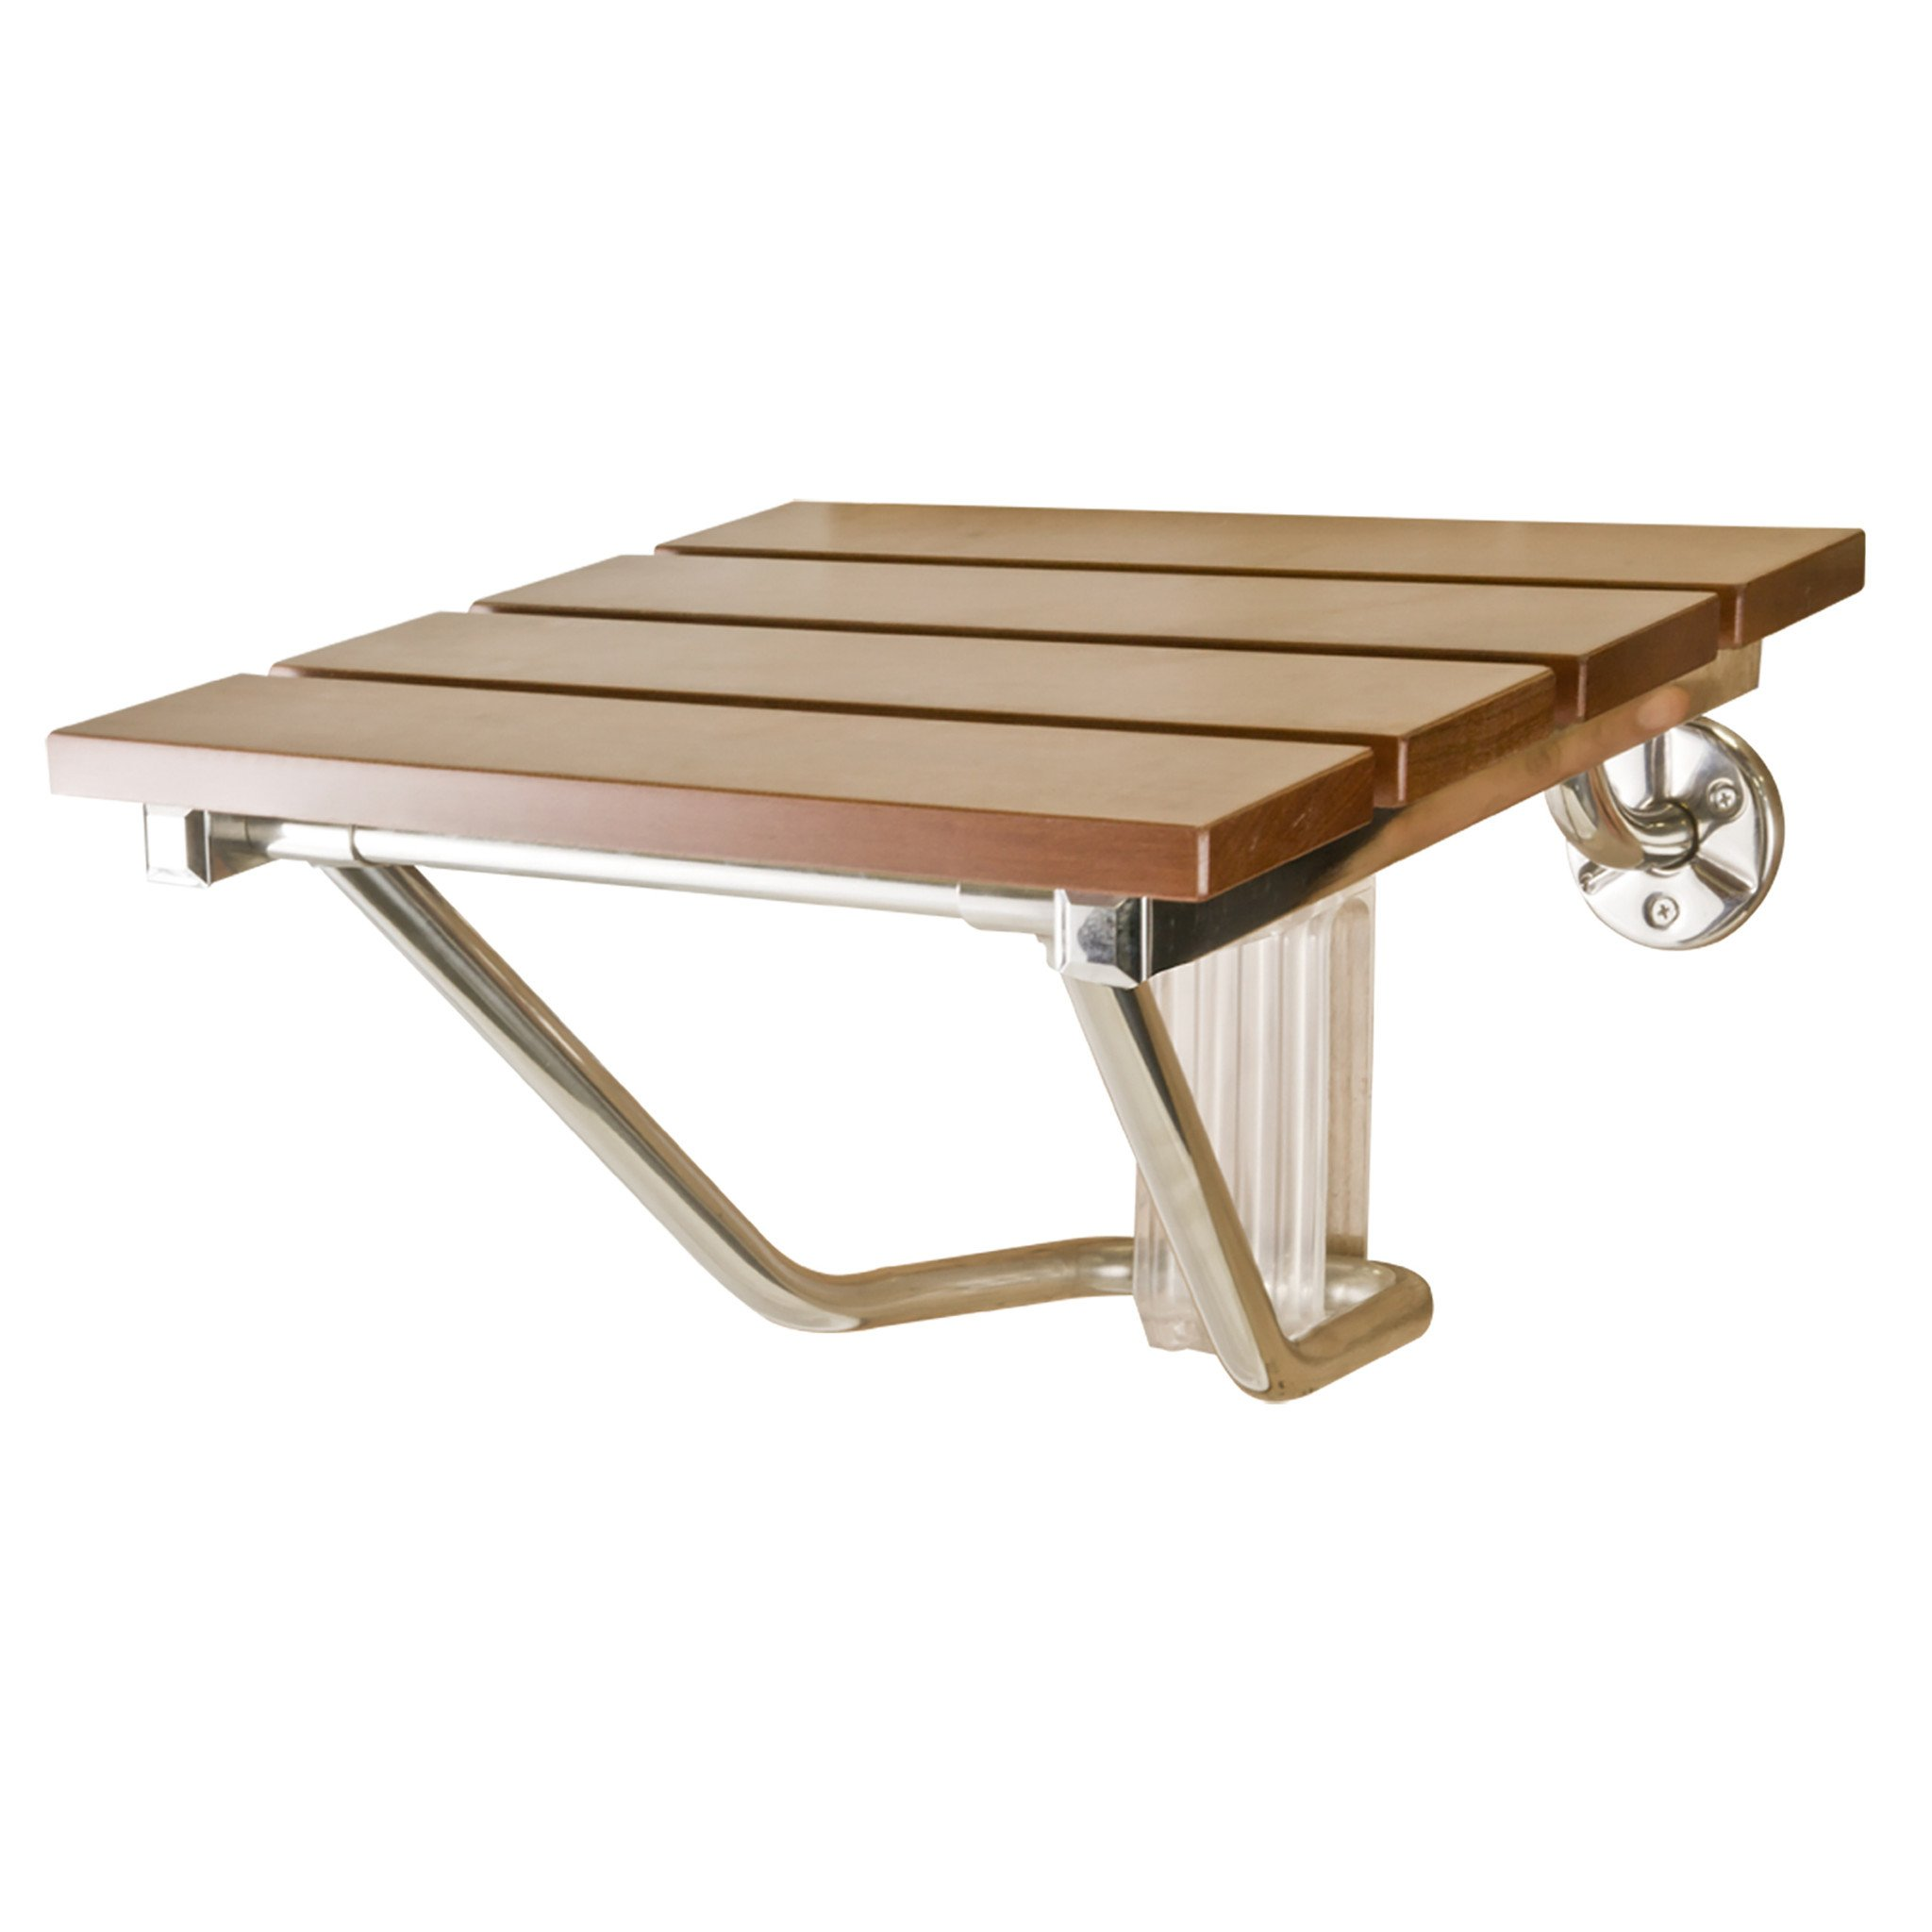 ElvaMunoz Folding Shower Seat Bath Seat Wall Mount Varnished Solid Wood Construction